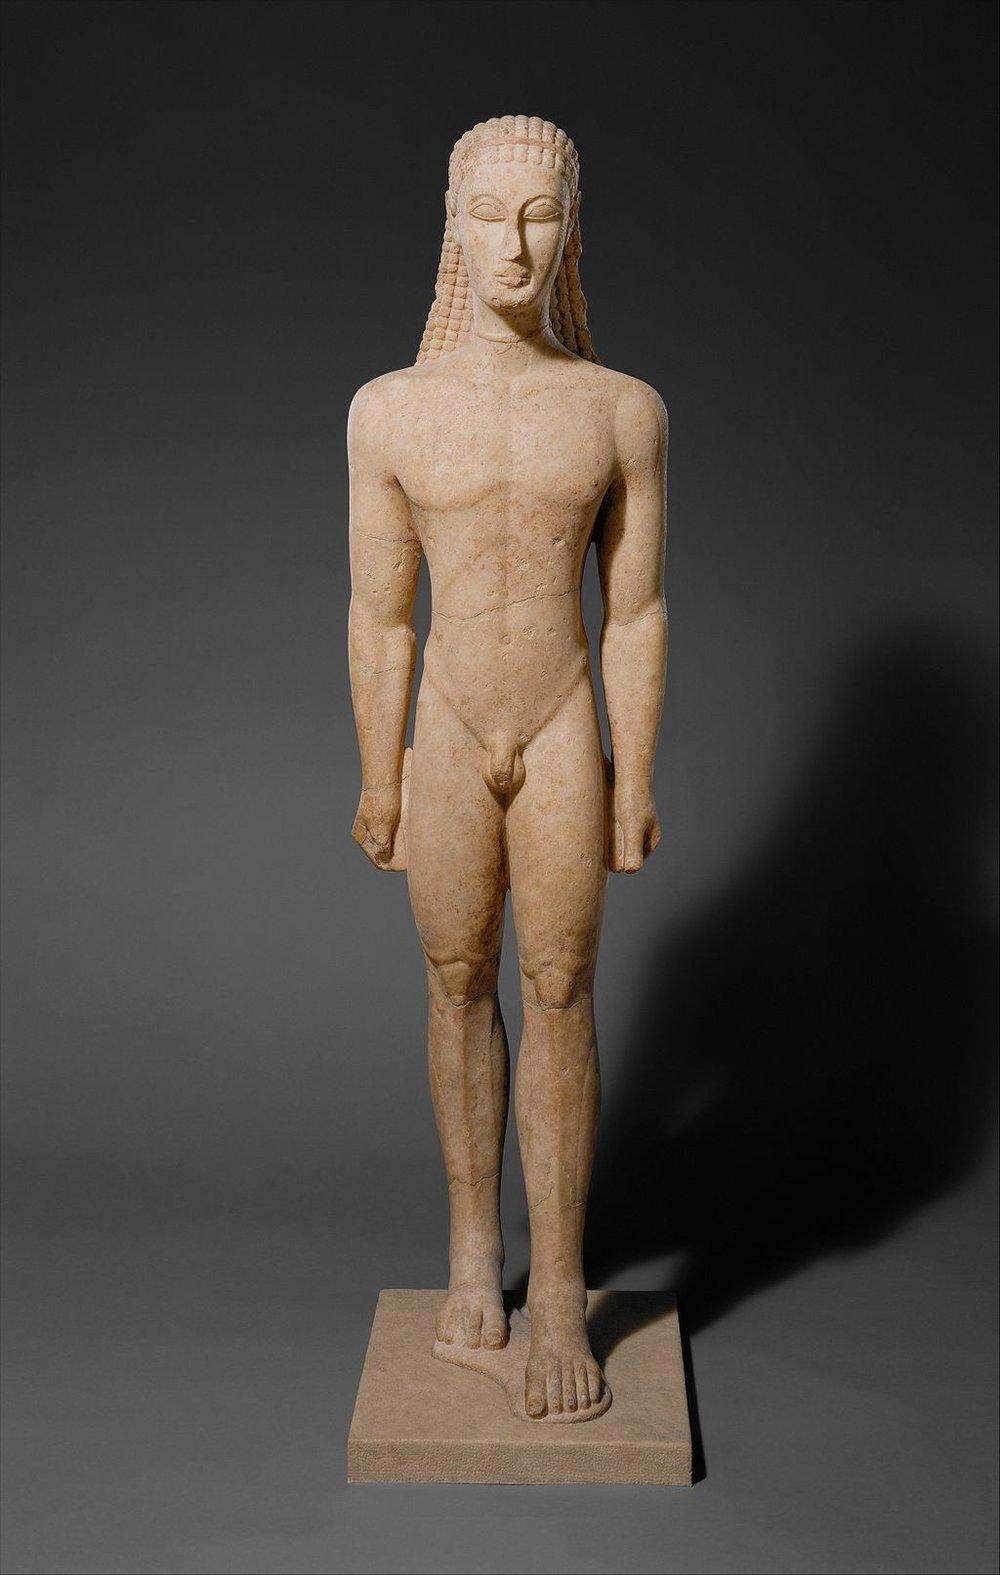 Marble_statue_of_a_kouros_(youth)_MET_DT263.jpg